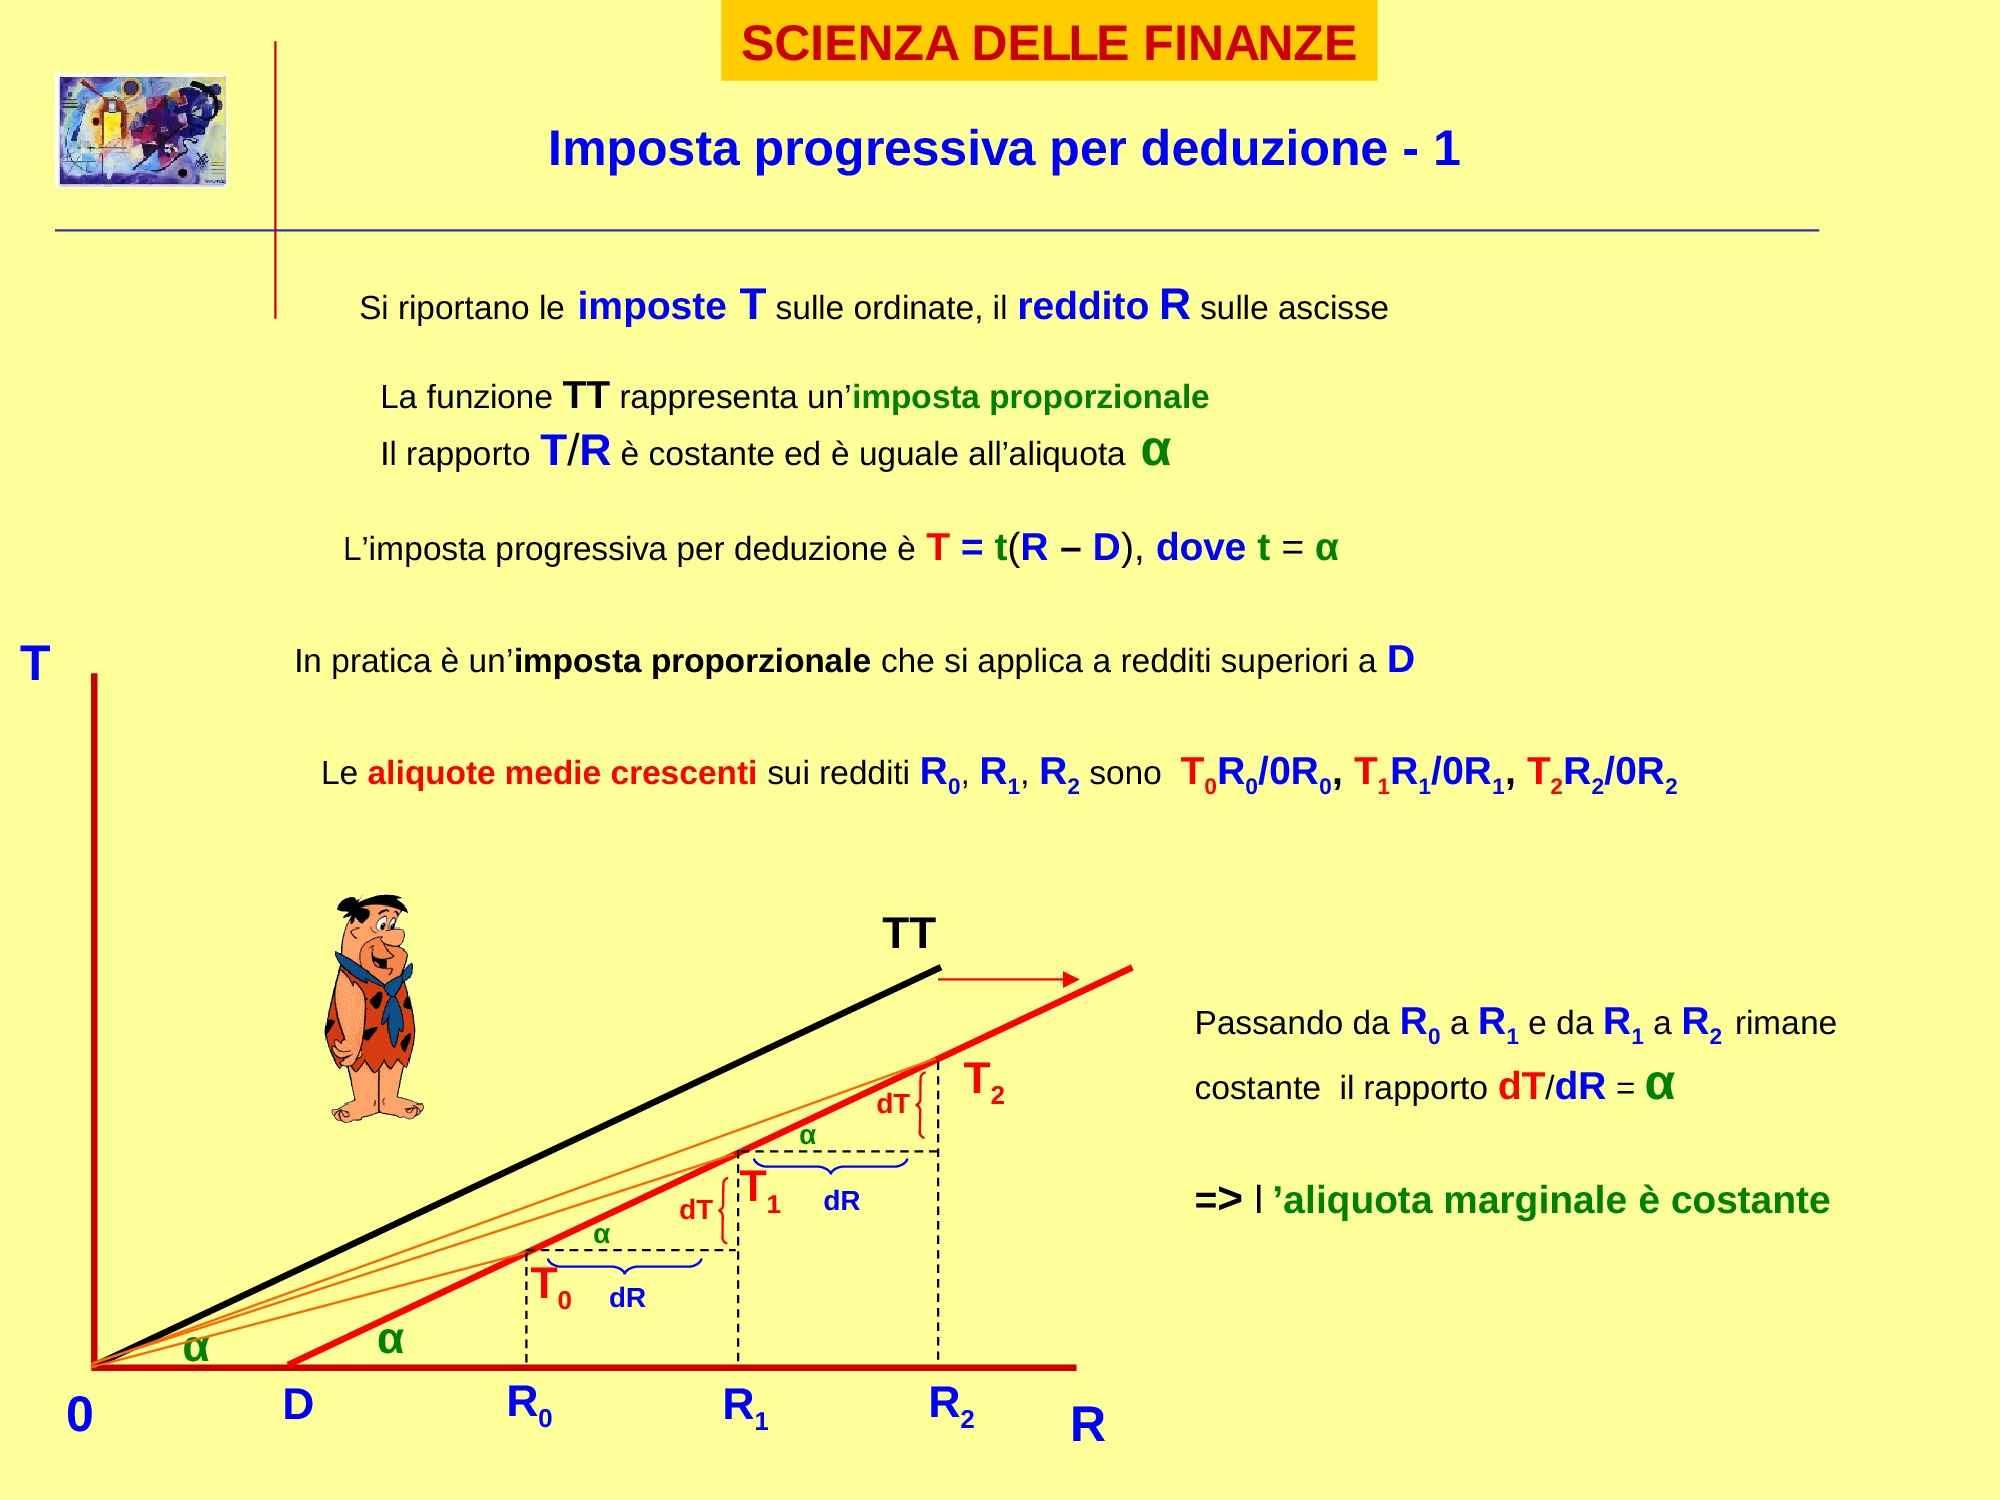 Imposta progressiva per deduzione